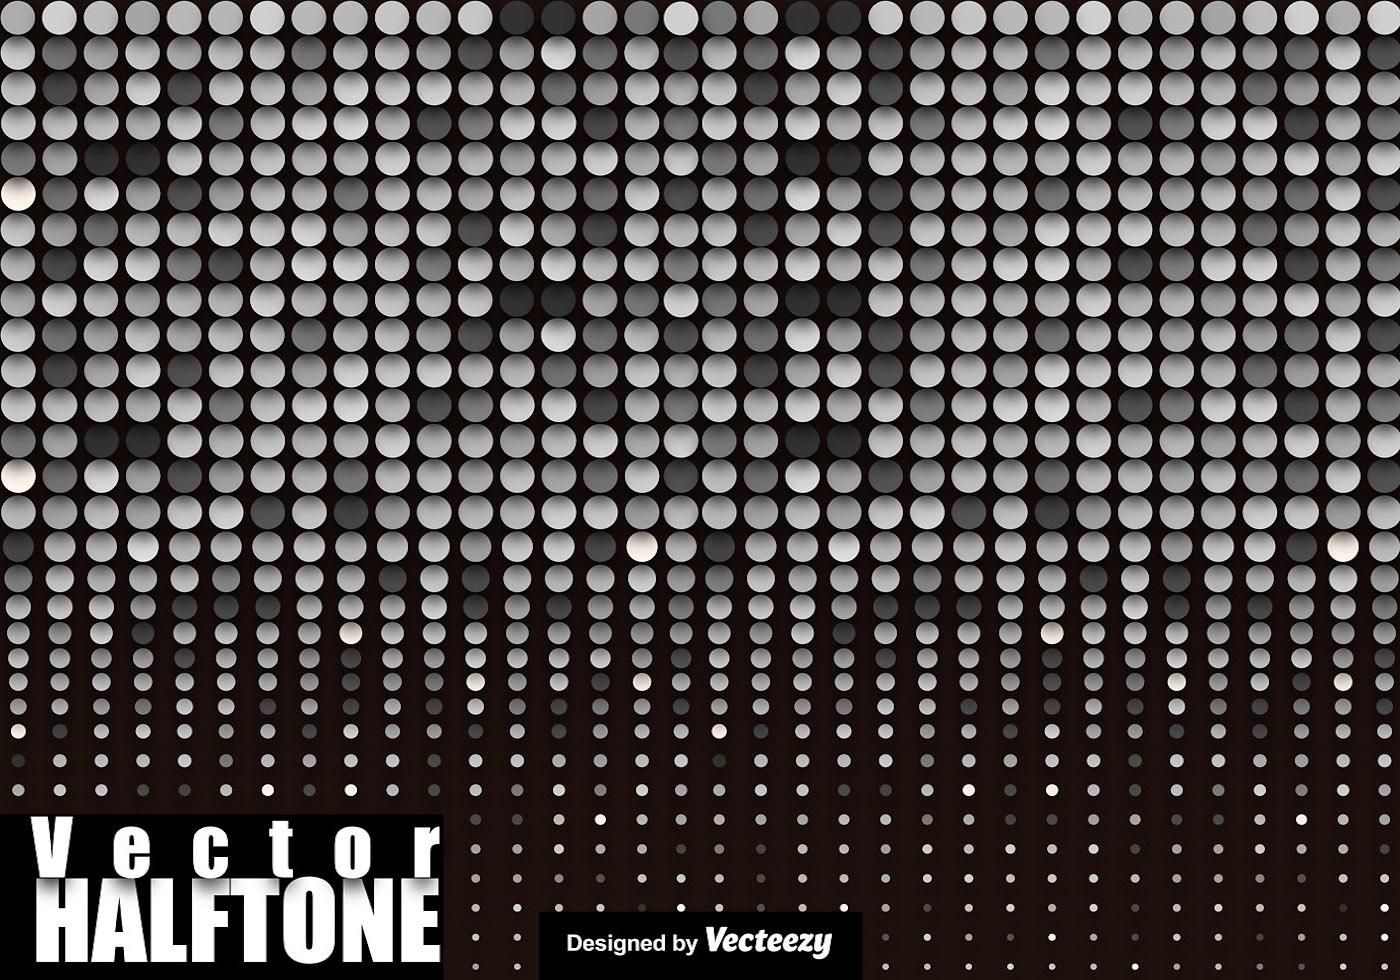 Black Dot Wallpaper Halftone Vector Backgrounds Download Free Vector Art